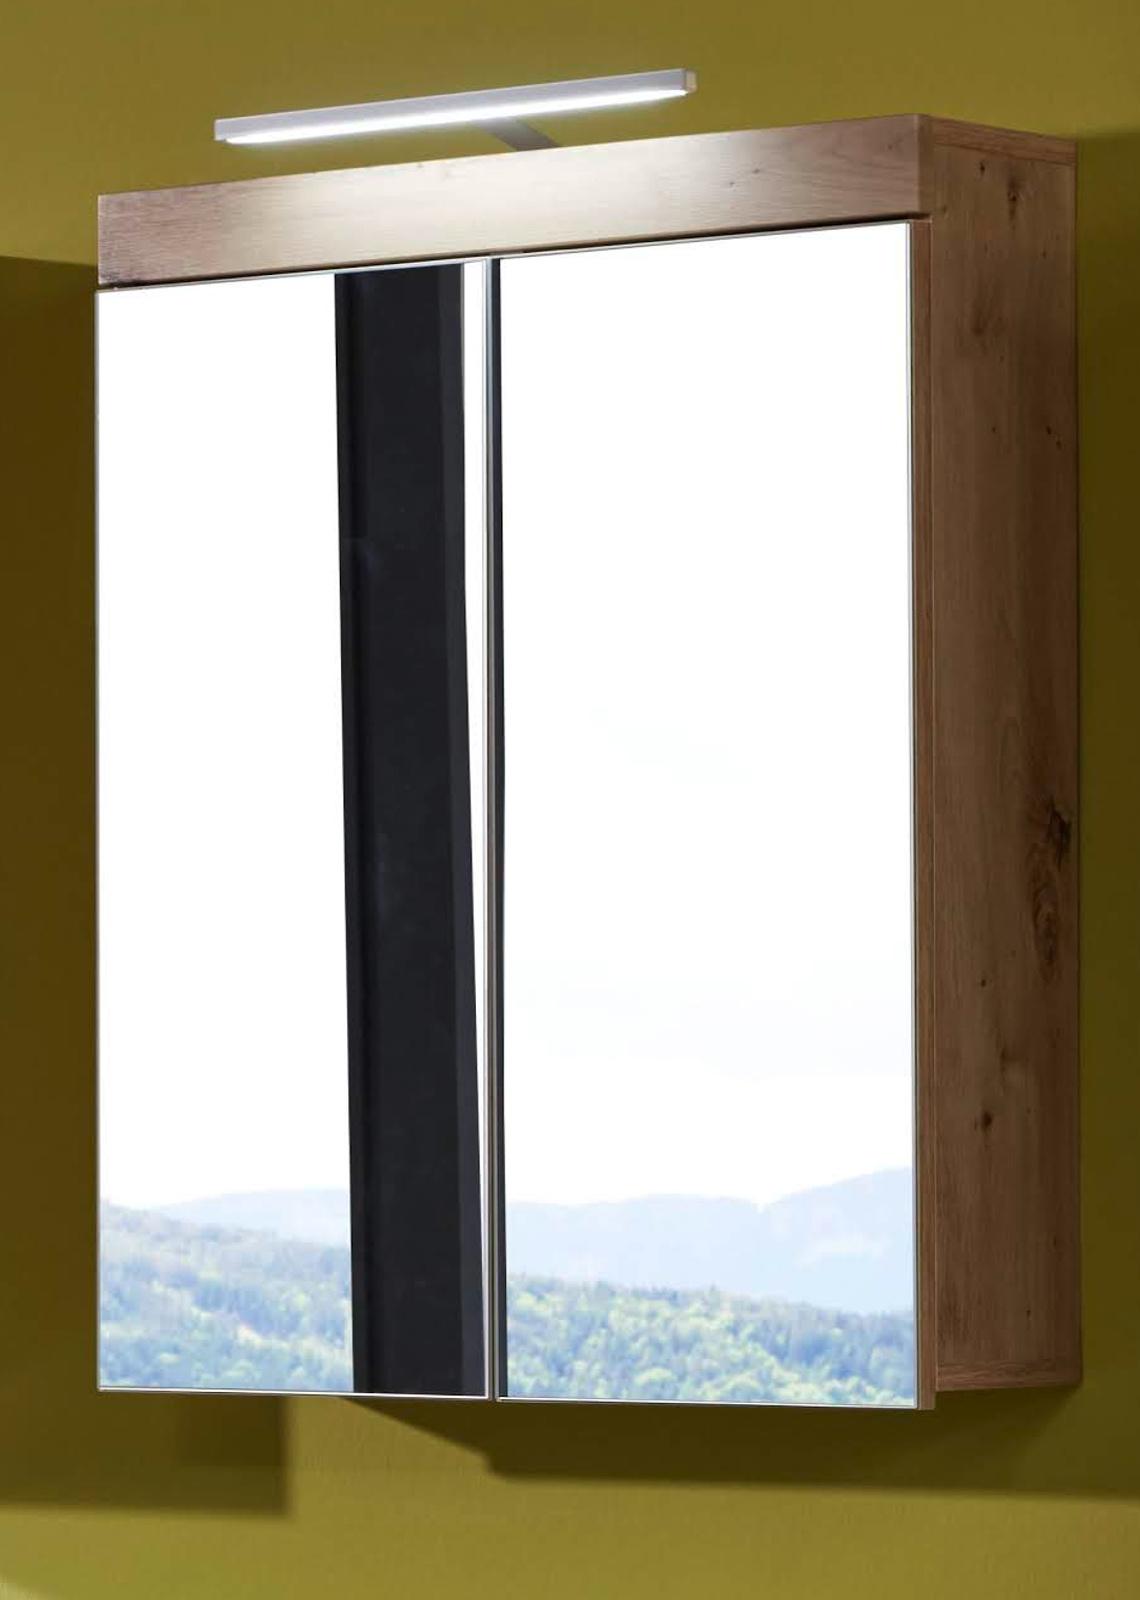 kinderbett jugendbett anthrazit grau hellgr n mixxi12. Black Bedroom Furniture Sets. Home Design Ideas